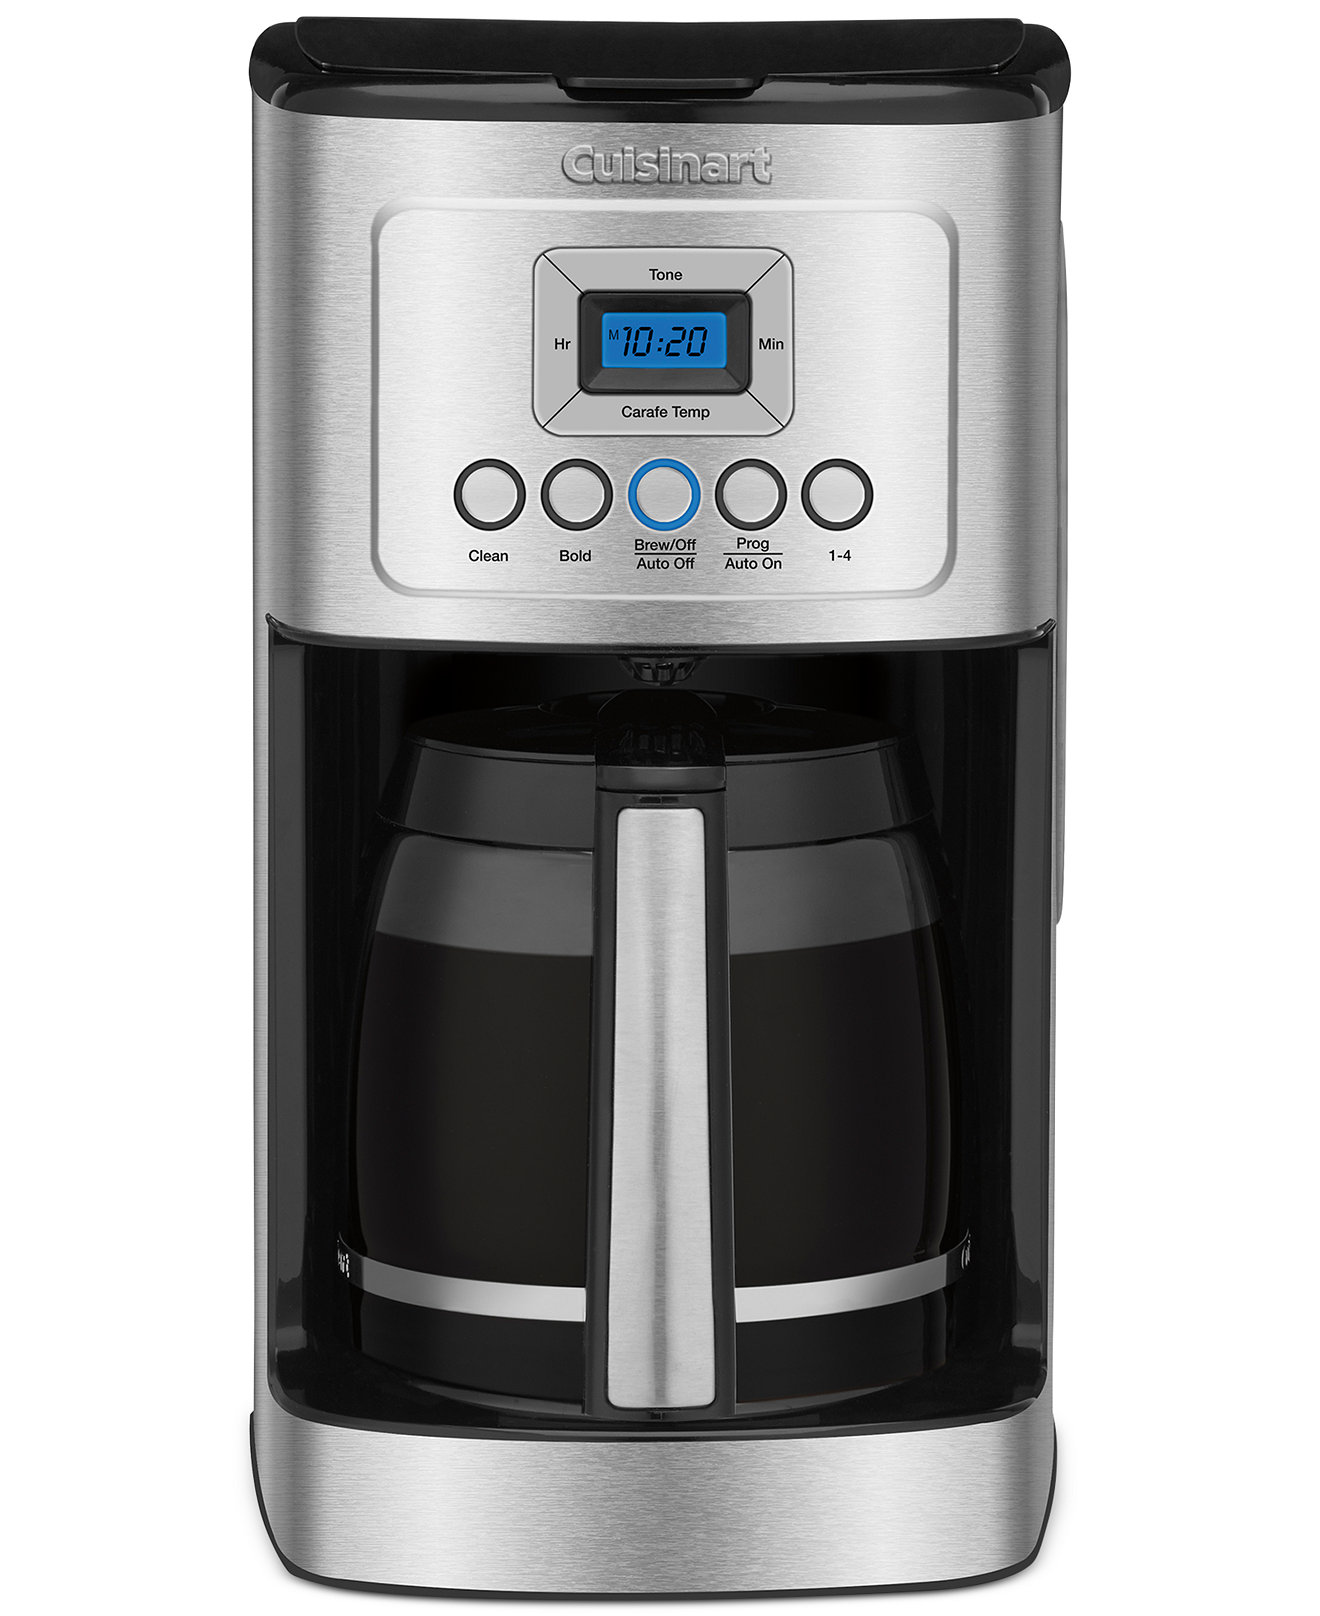 Macys Kitchen Appliances Cuisinart Dcc 3200 Perfectemp 14 Cup Programmable Coffee Maker